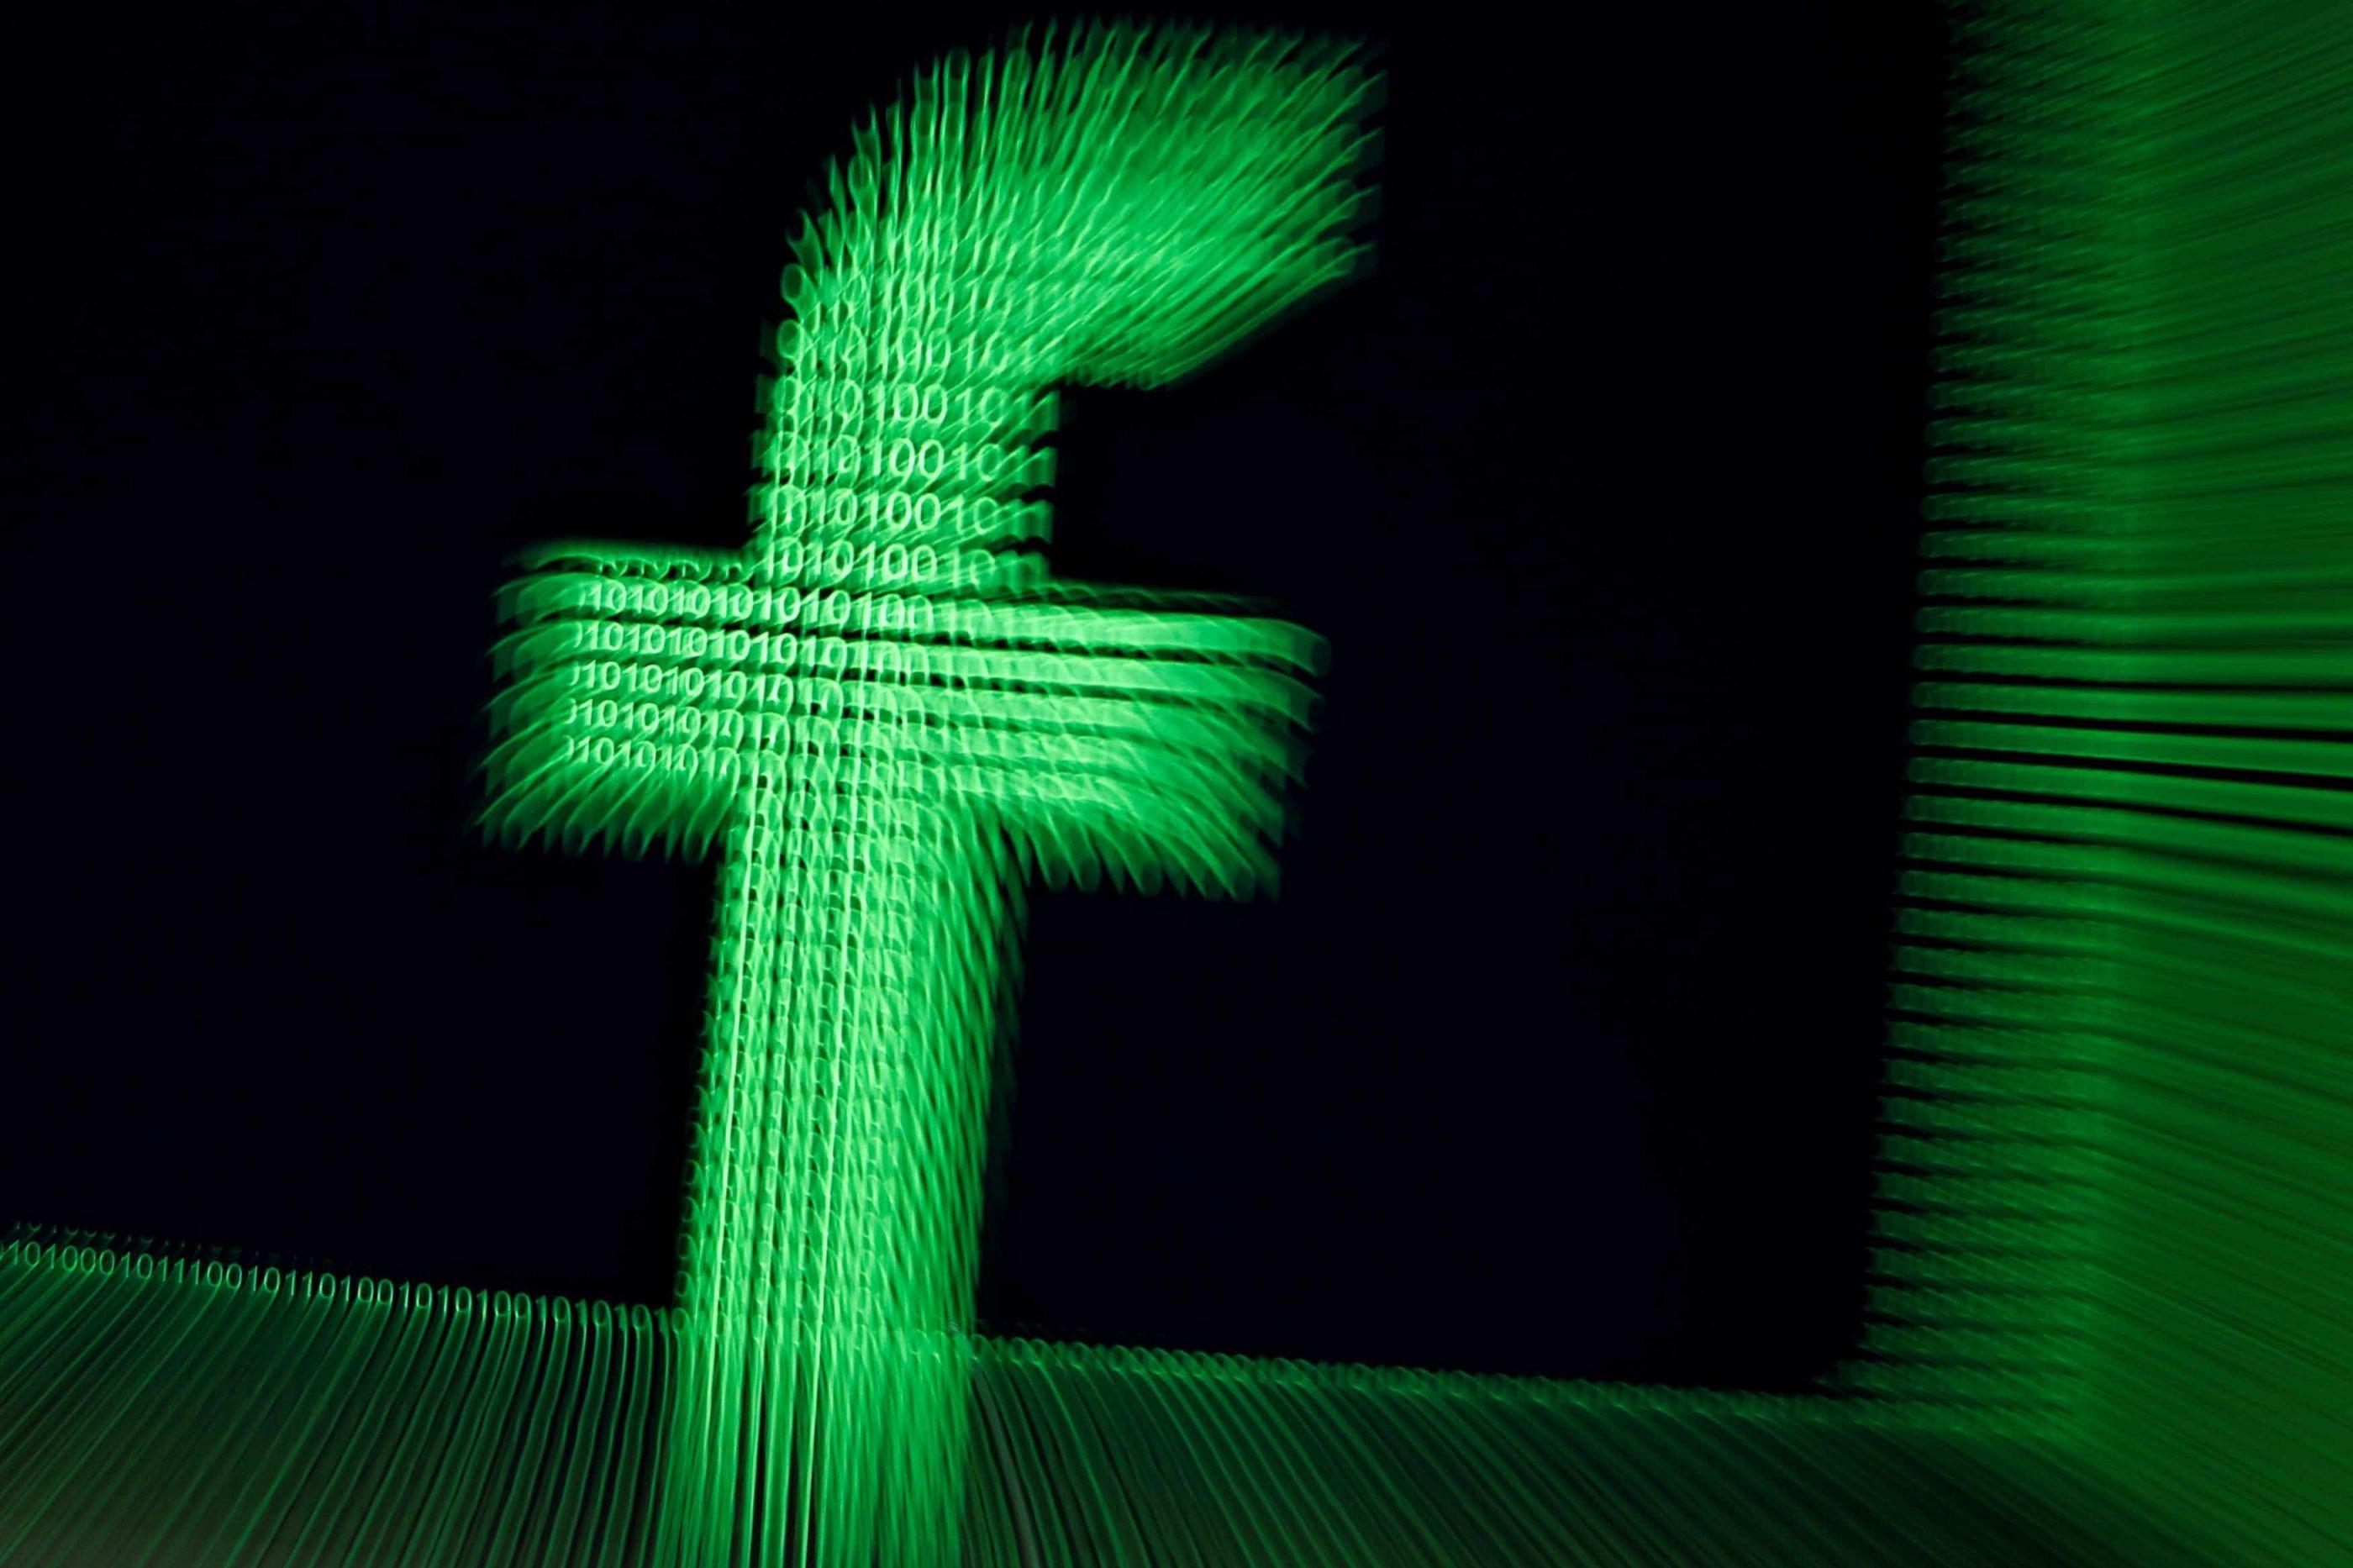 Escândalo Cambridge Analytica vale multa milionária ao Facebook